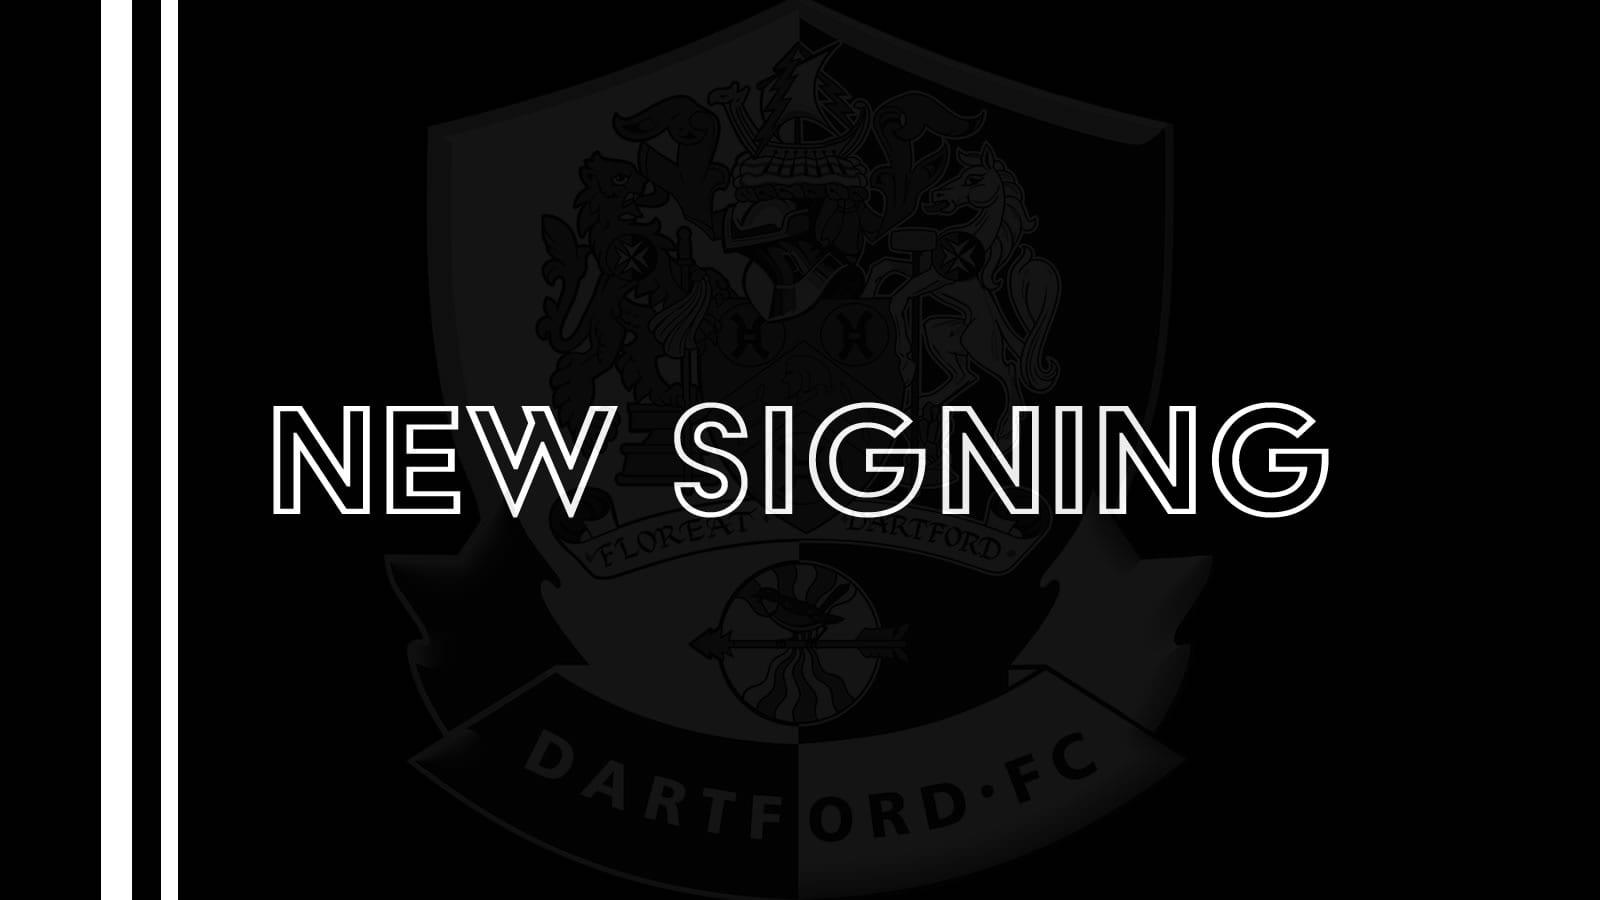 New Signing – Luke Warner-Eley